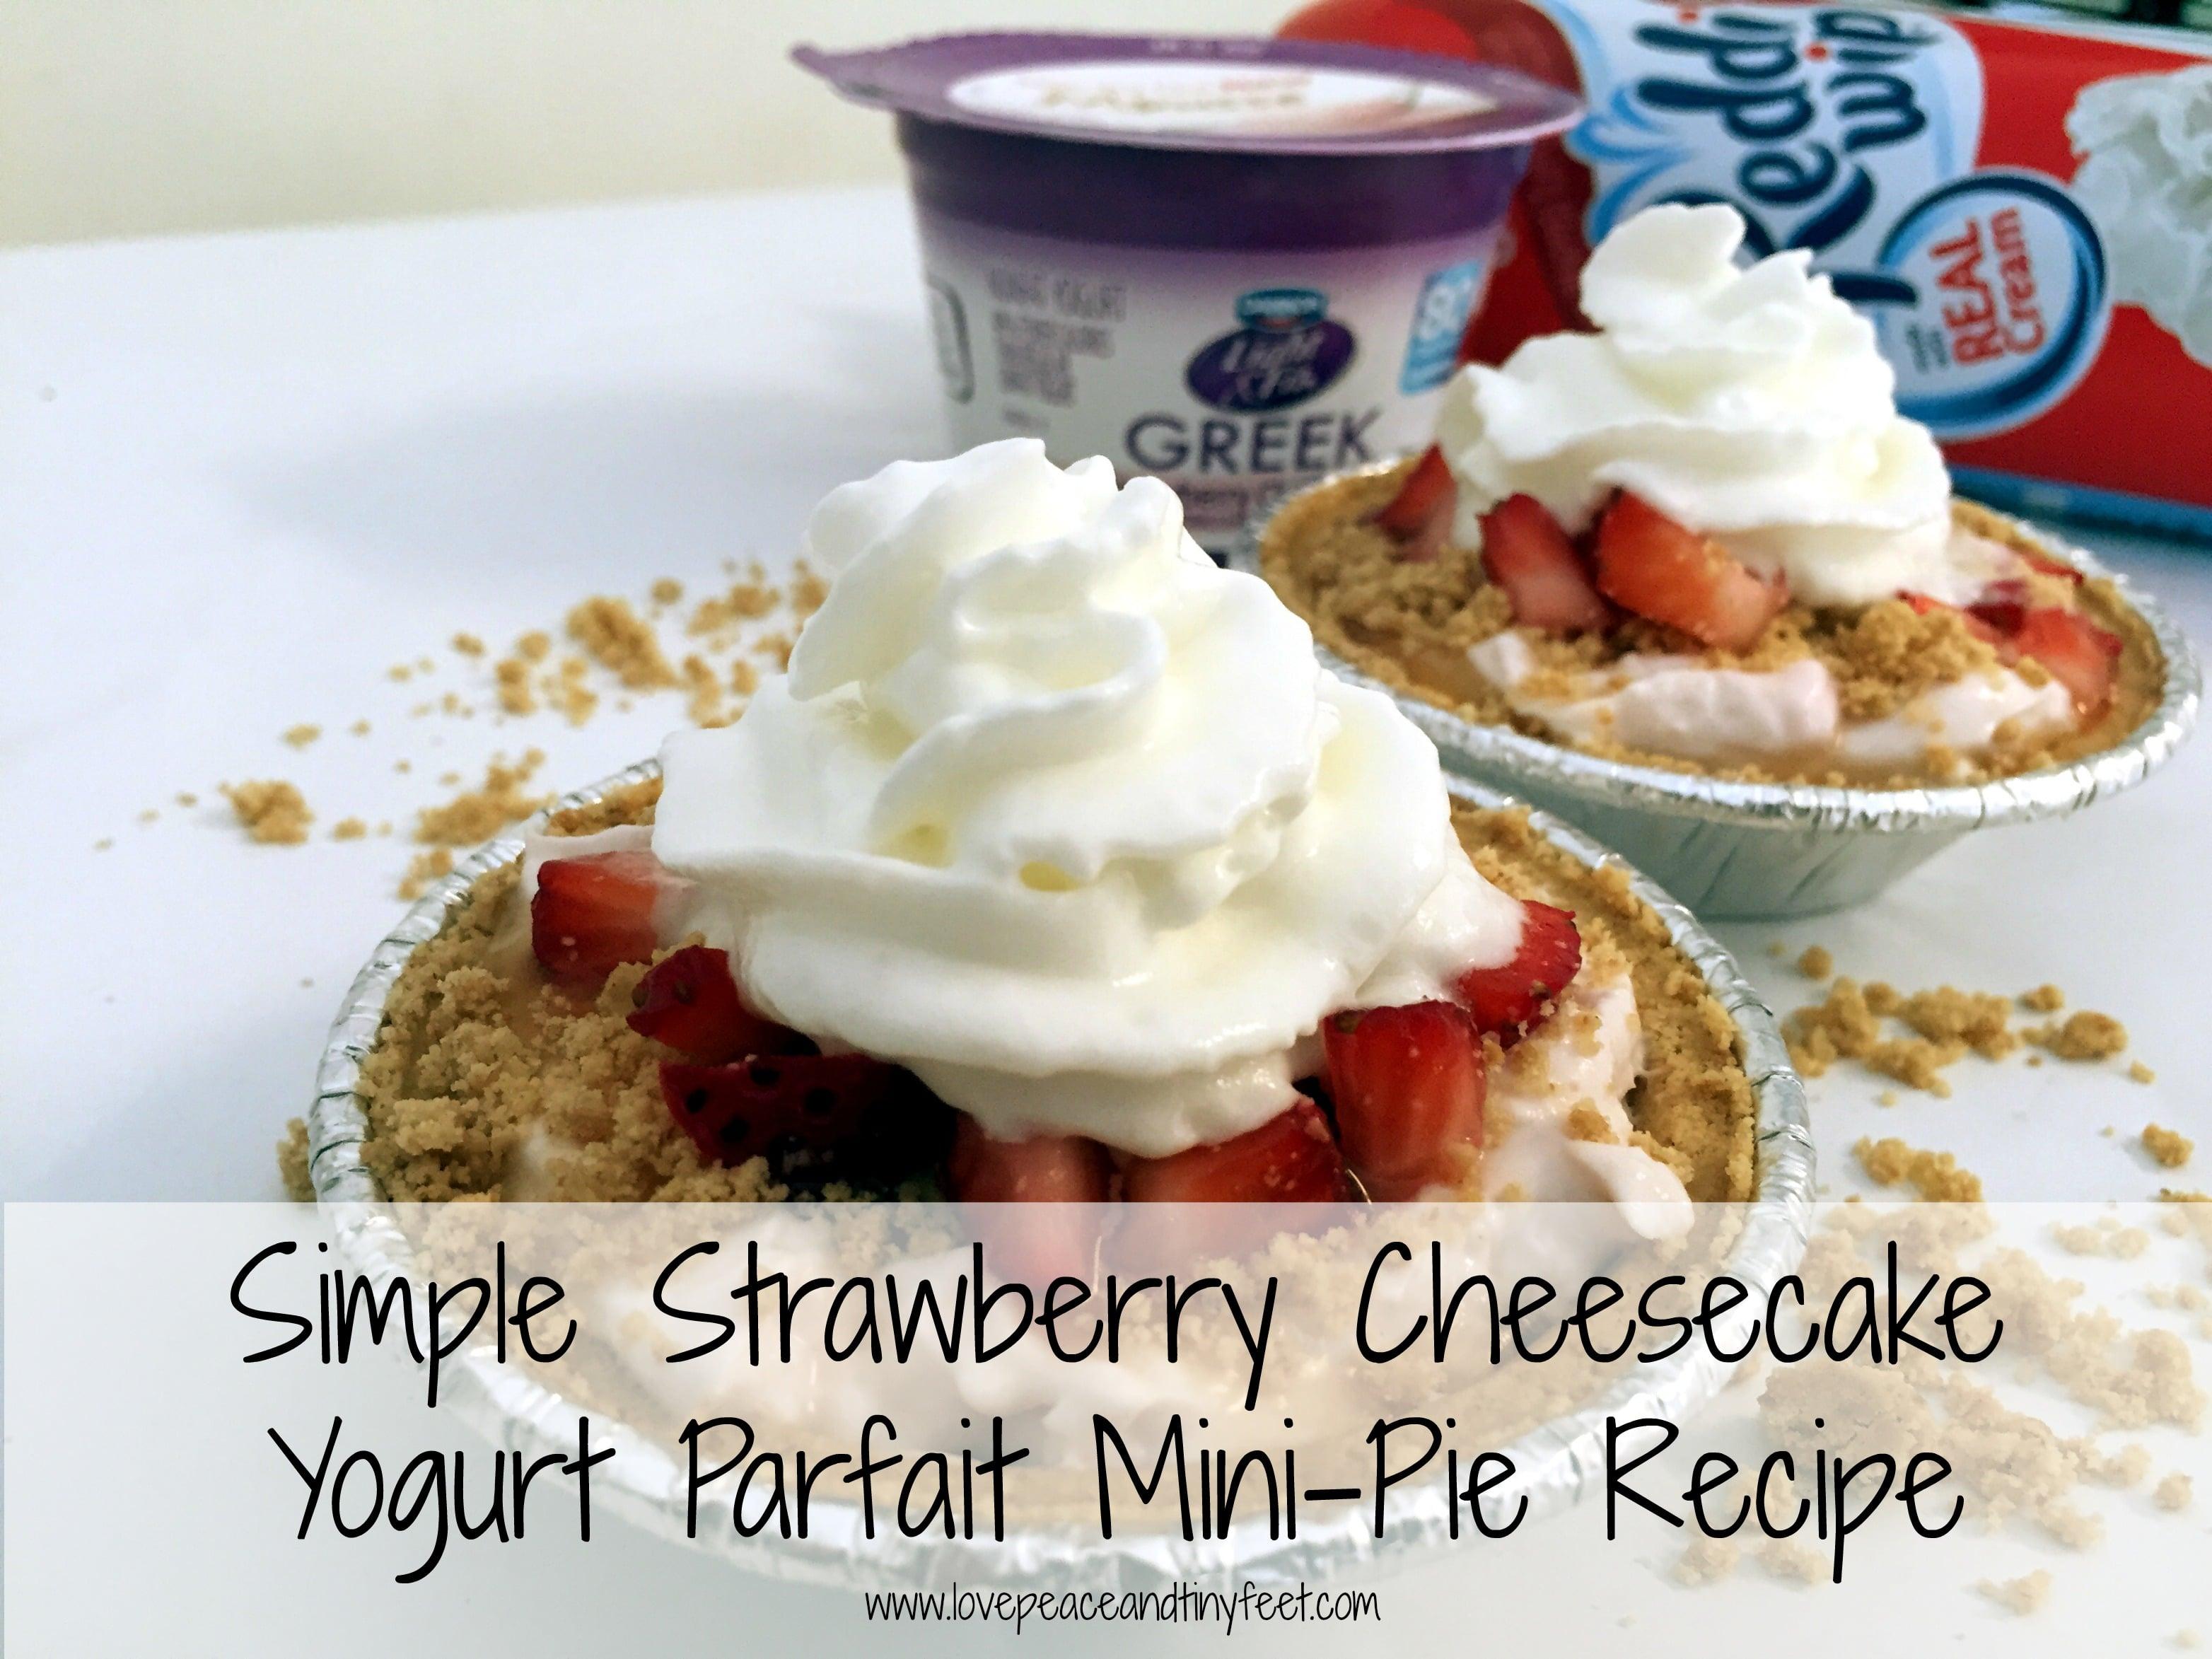 Simple Strawberry Cheesecake Yogurt Parfait Mini Pie Recipe